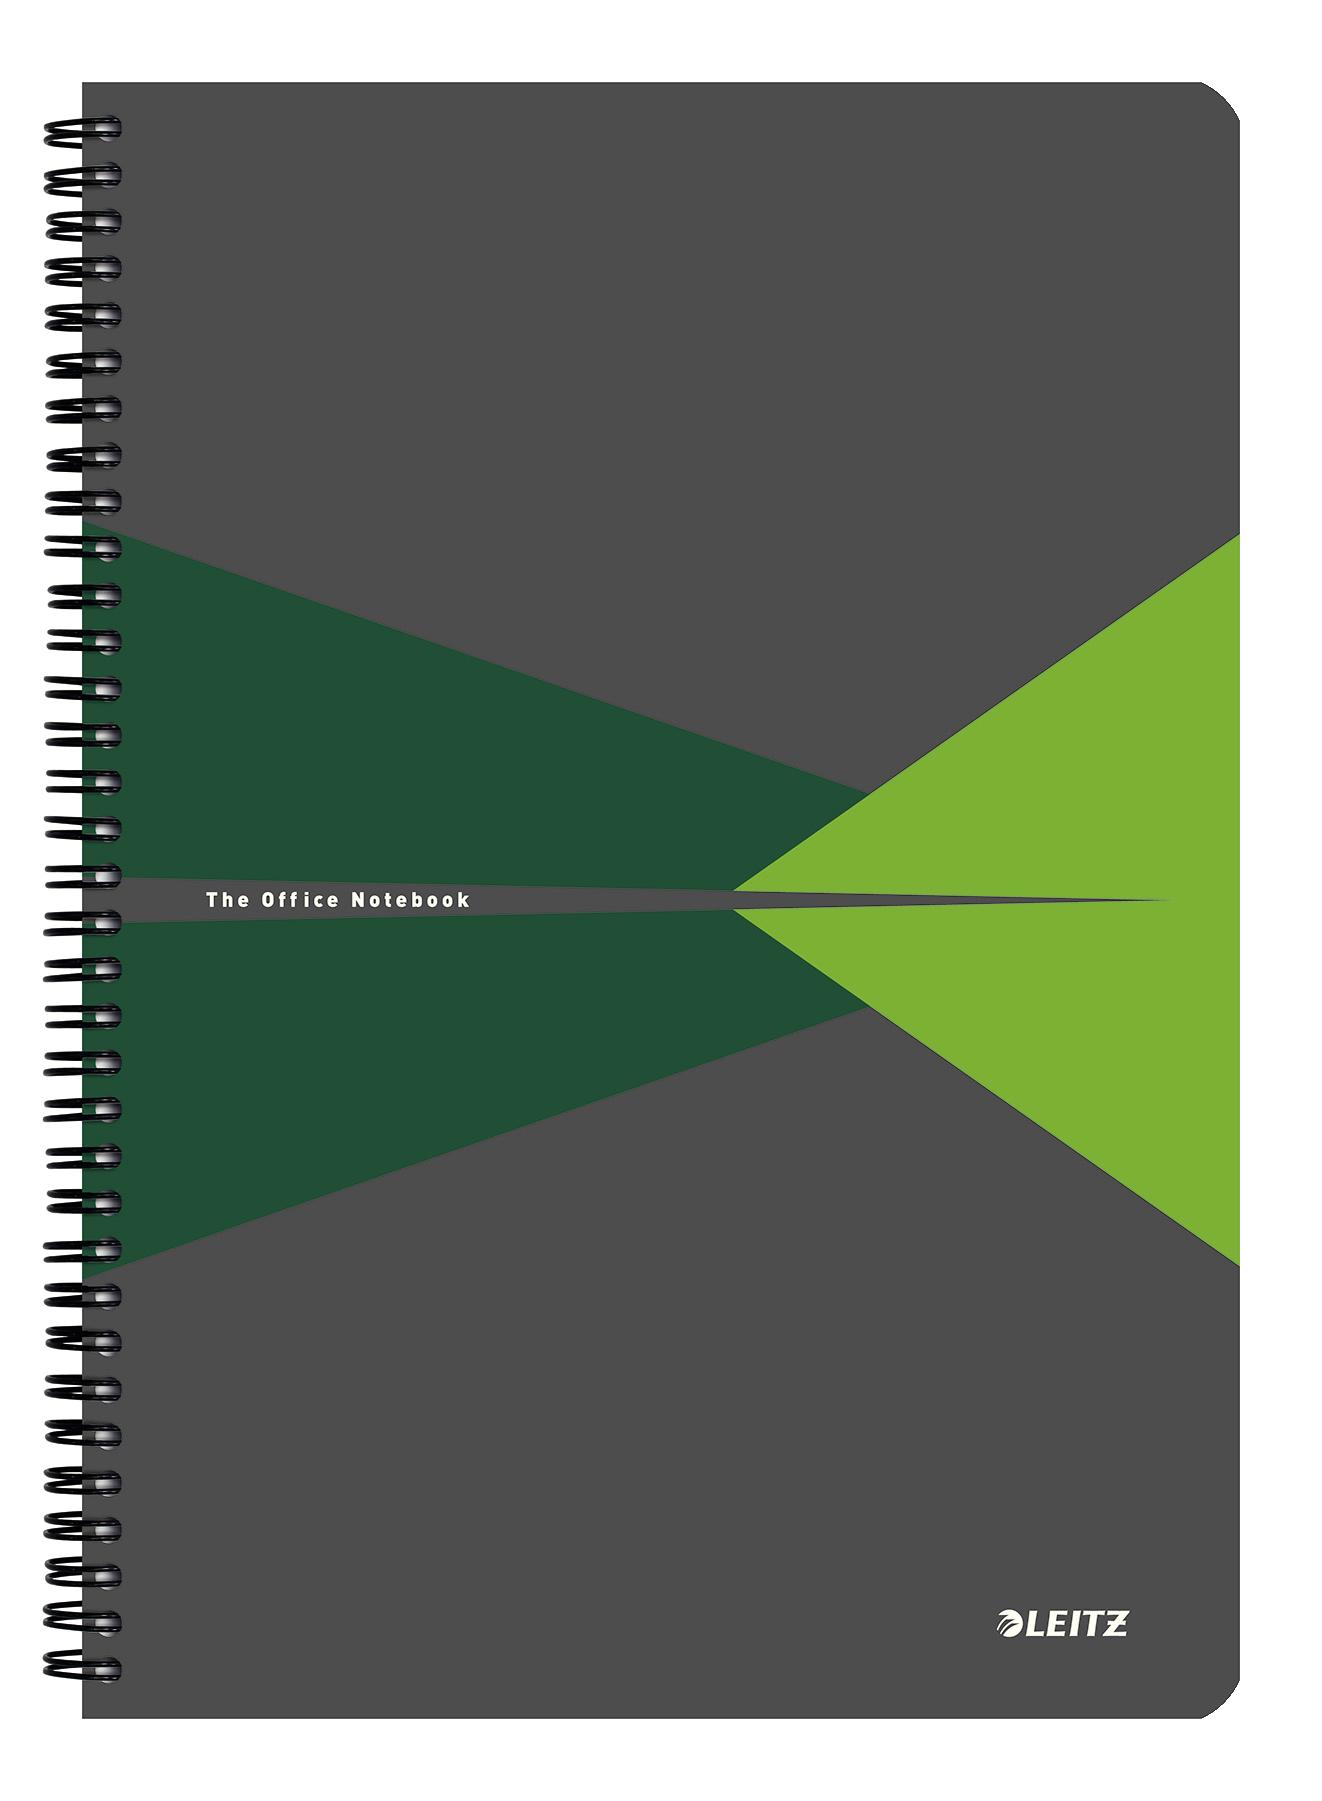 Caiet de birou LEITZ Office, carton, A4, cu spira, dictando - verde